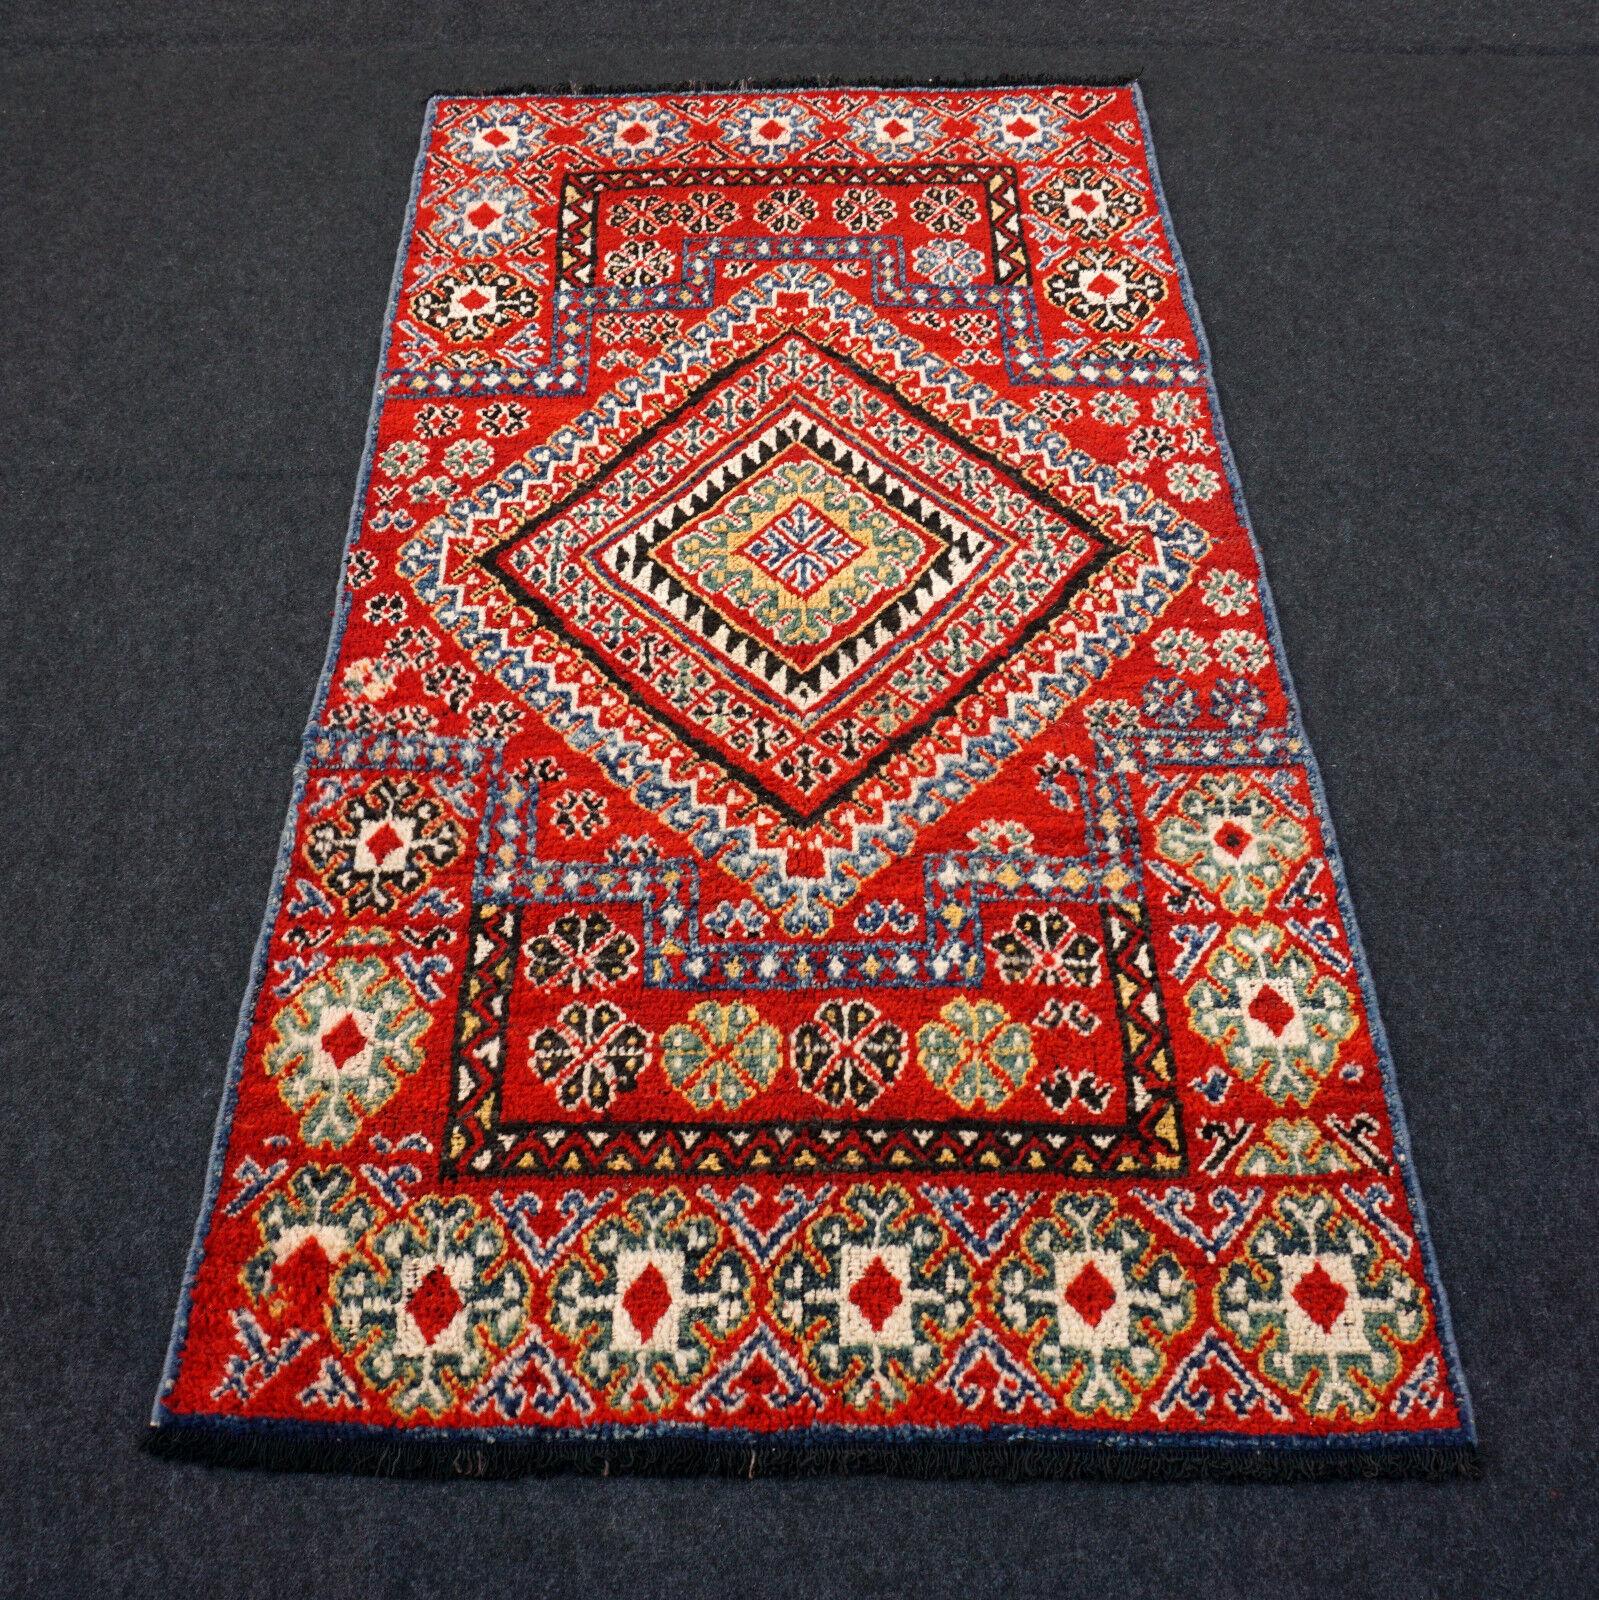 Orient alfombra bereber 200 x 109 cm de Marruecos oriental Carpet Rug tappeto tapis